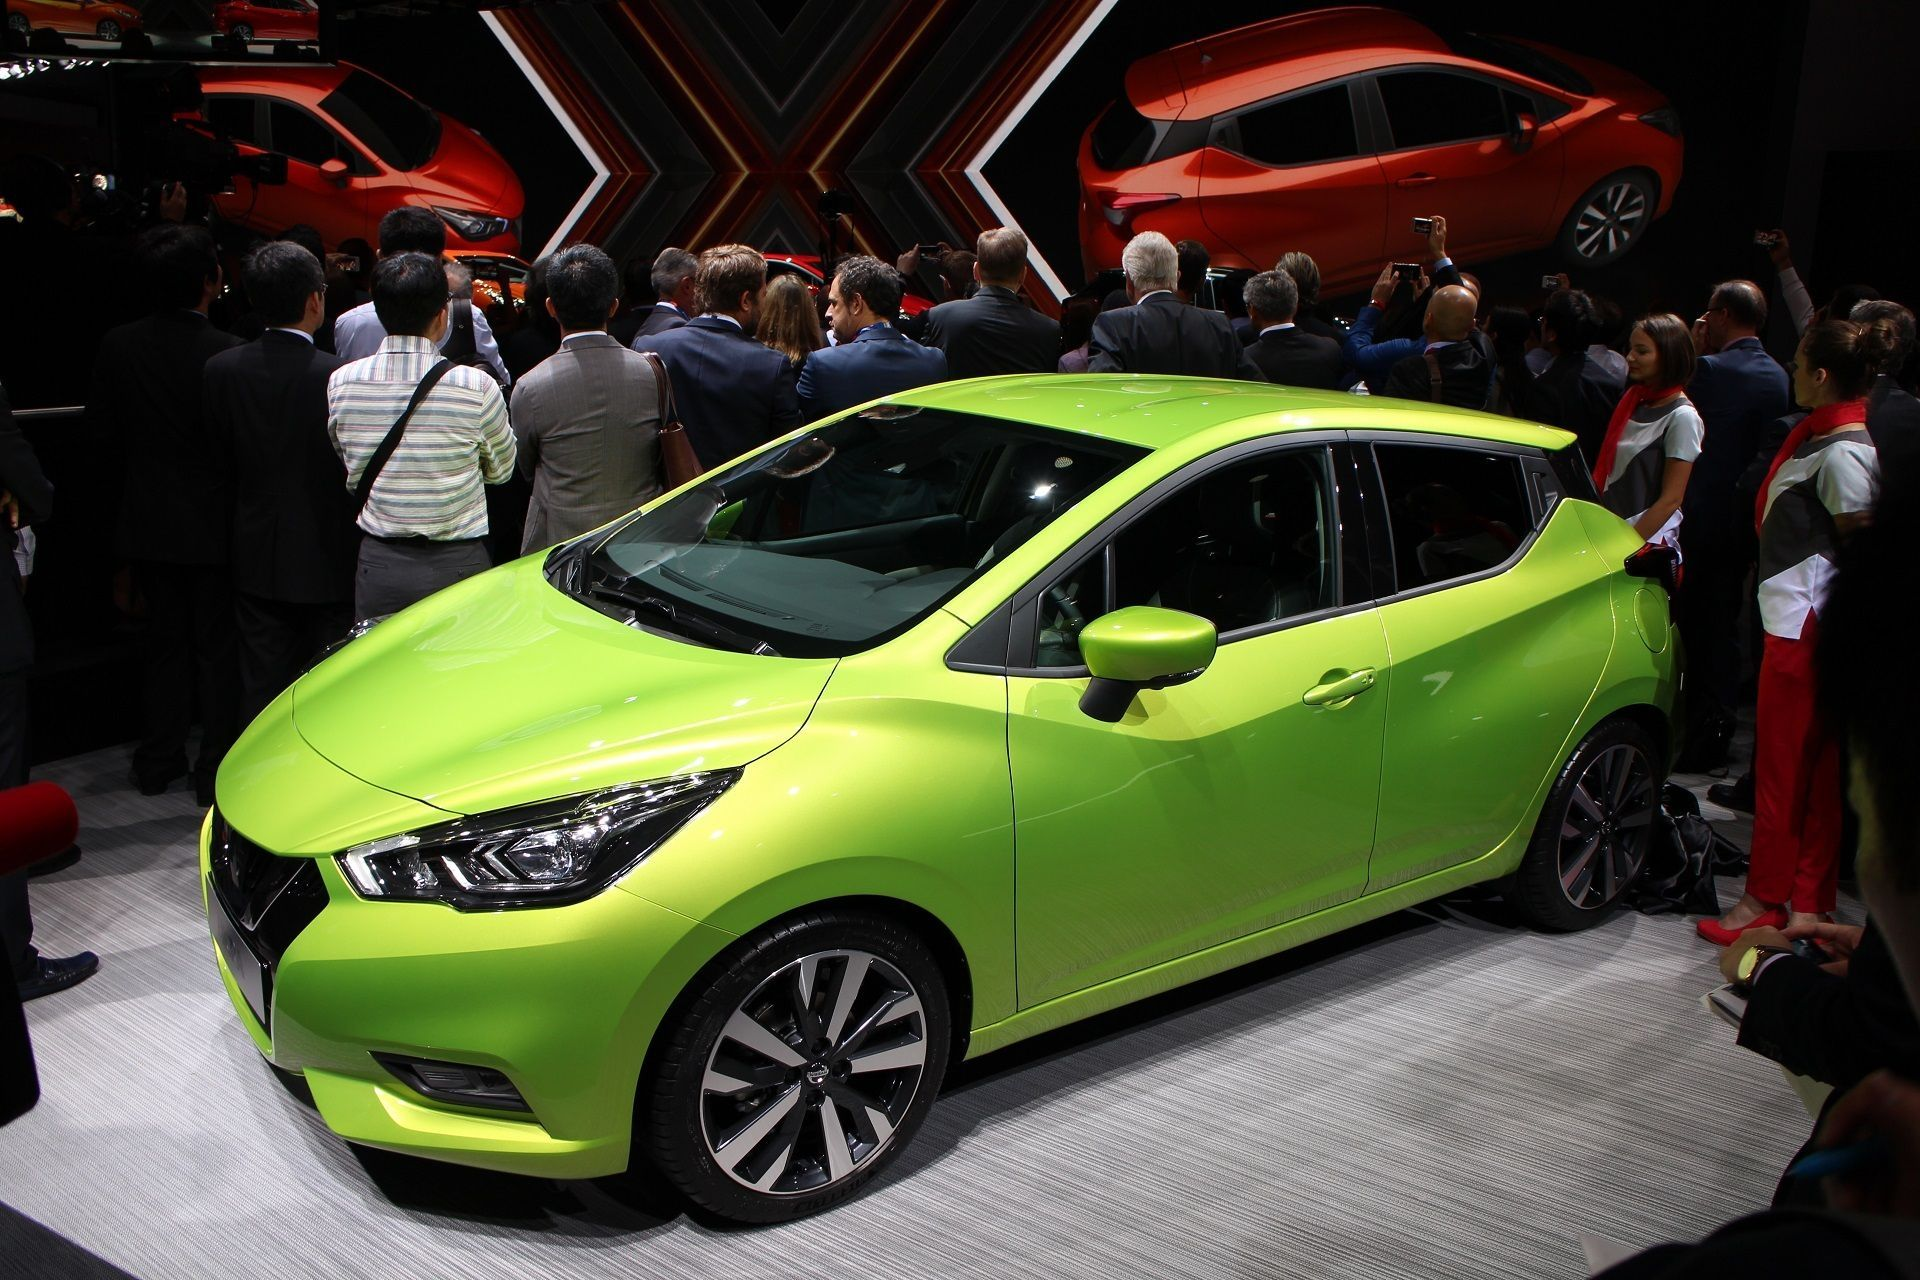 Best Nissan Micra 2020 Spesification Car Price 2019 New Nissan Micra Nissan New Cars